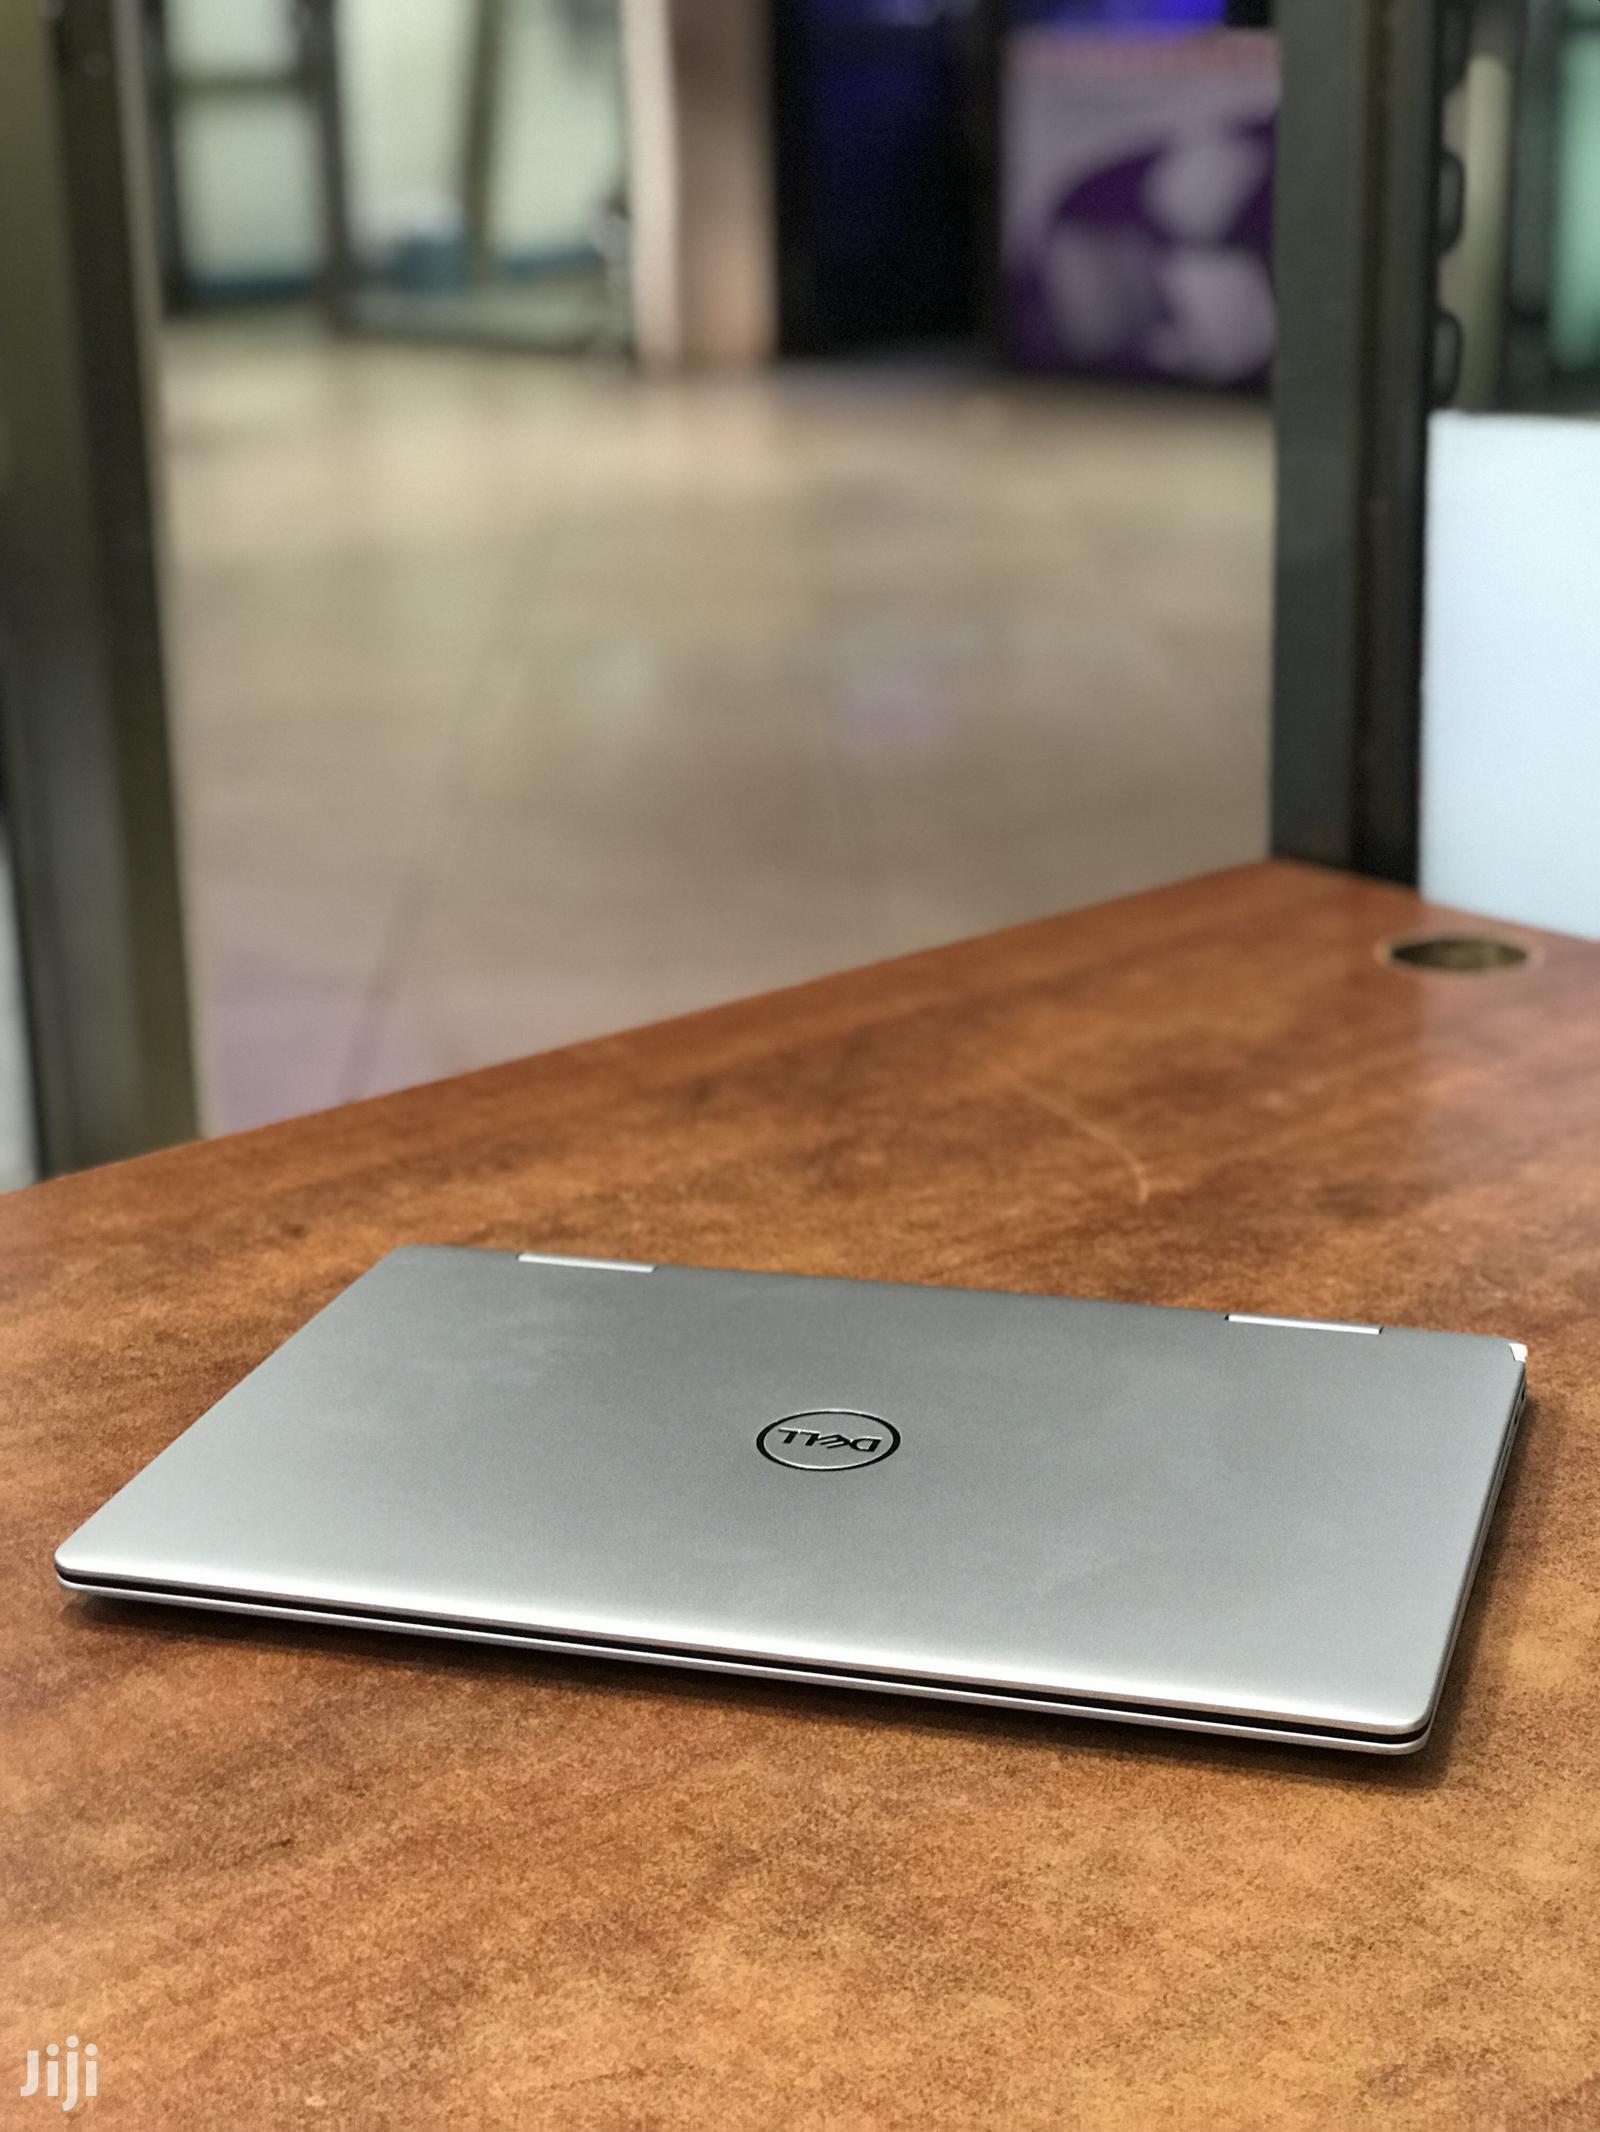 New Laptop Dell Inspiron 15 7000 8GB Intel Core I7 SSD 256GB